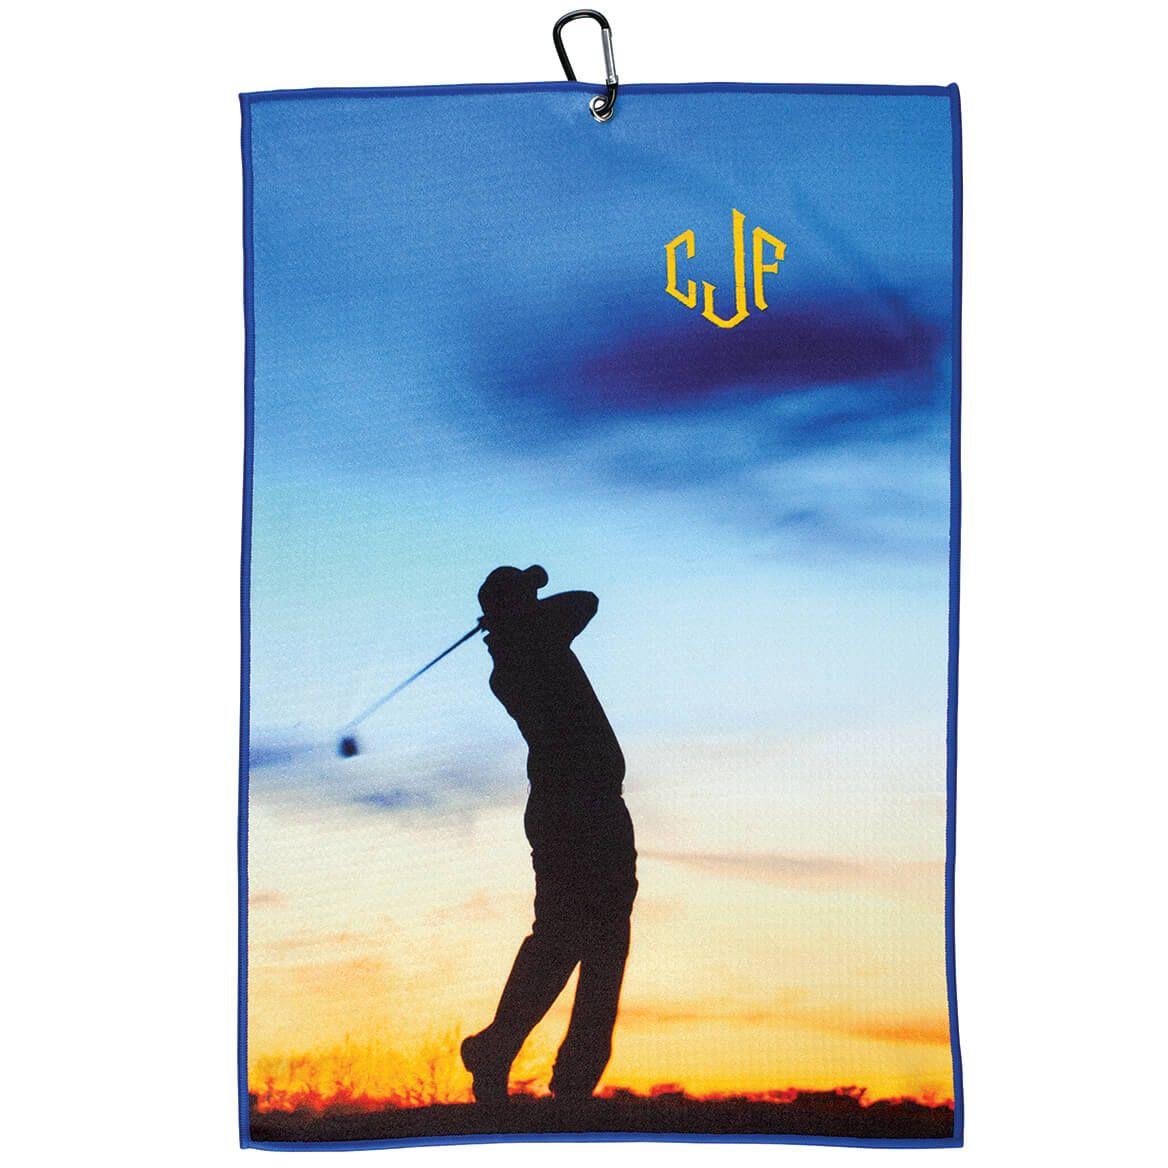 Personalized Vertical Silhouette Microfiber Golf Towel-371791